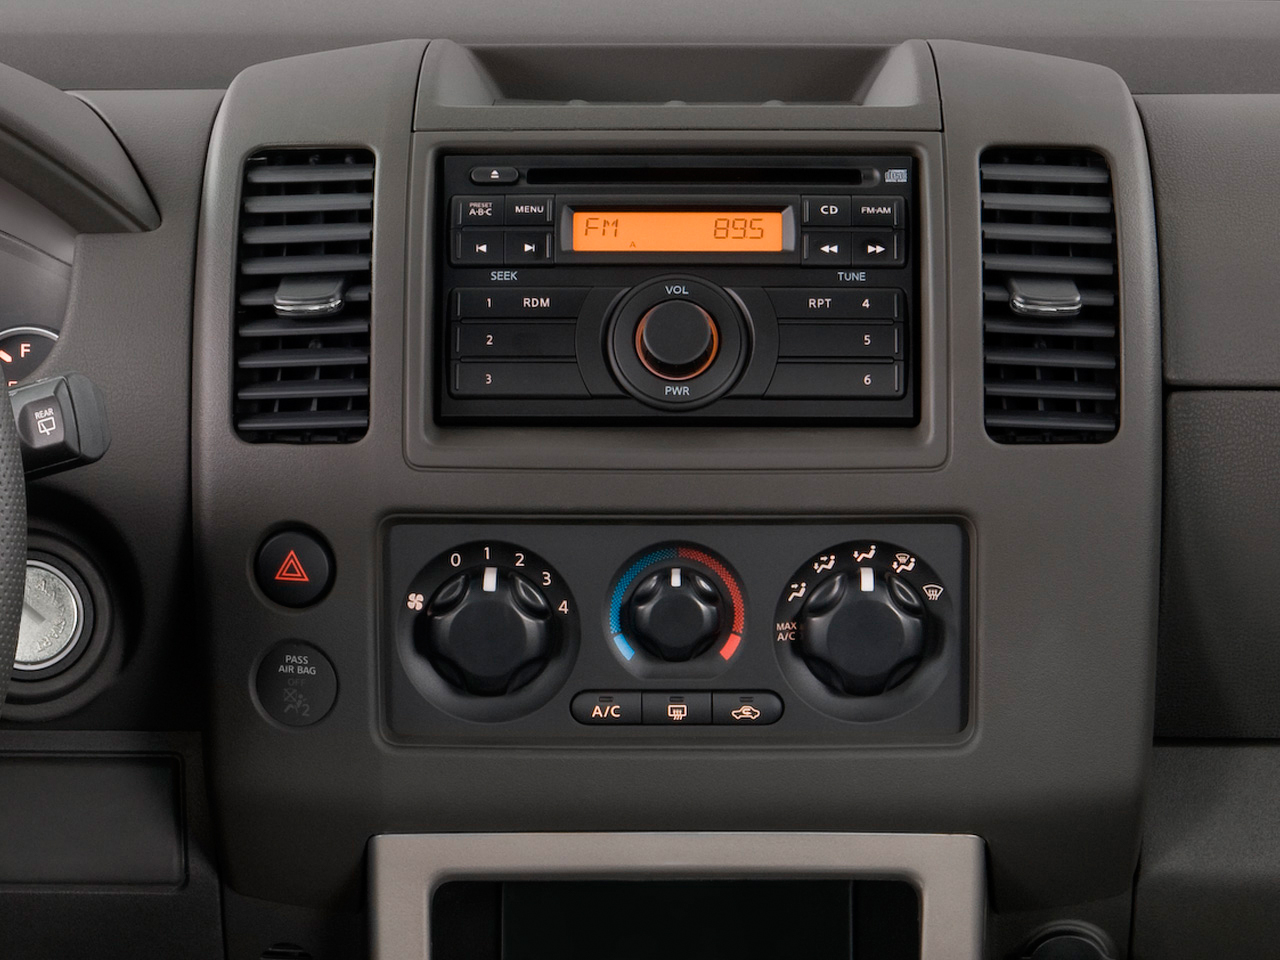 2009 Nissan Pathfinder LE 4x4 - Nissan Midsize SUV Review ...